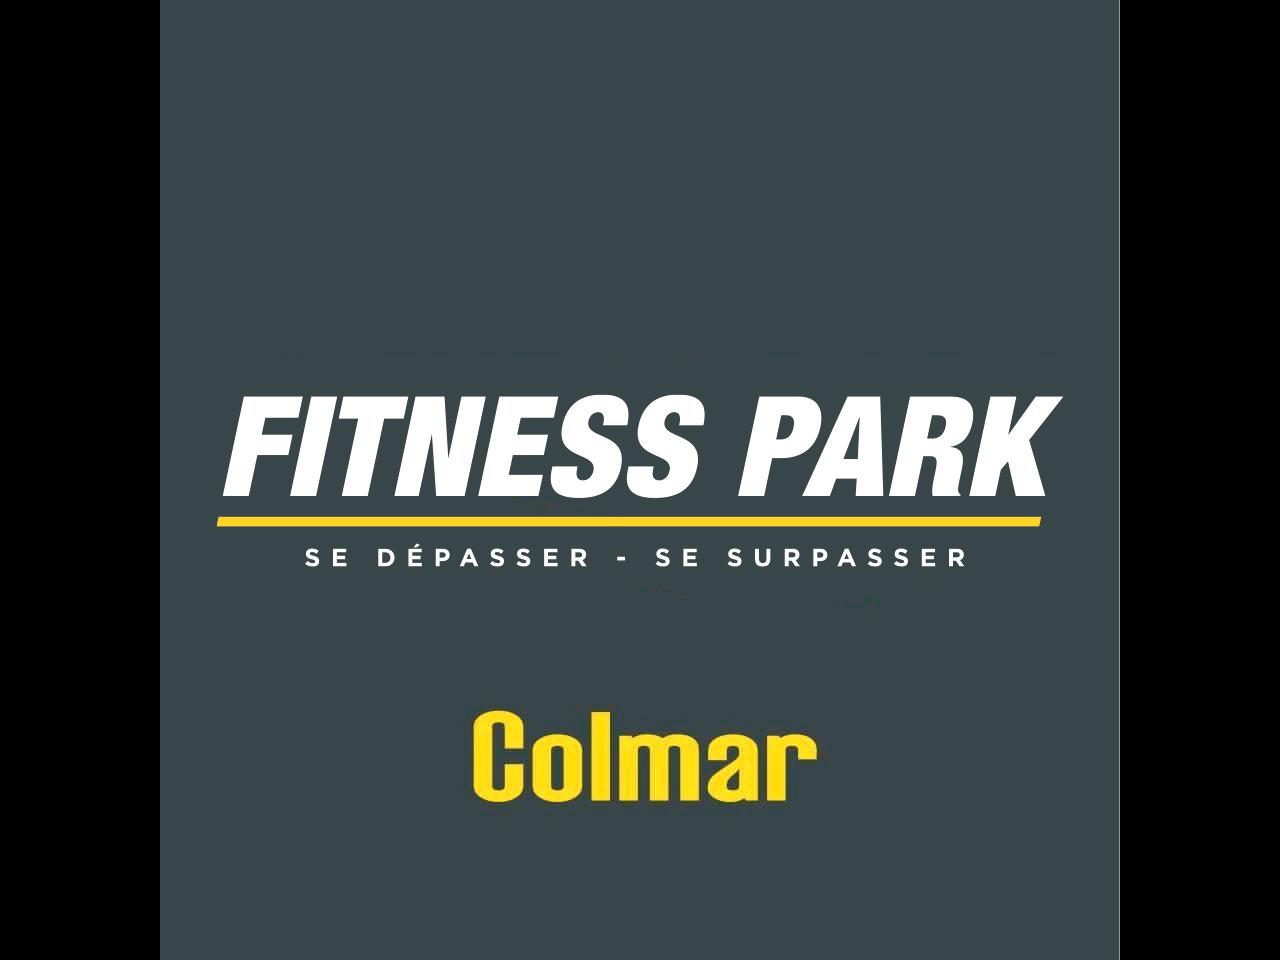 Fitness Park Colmar